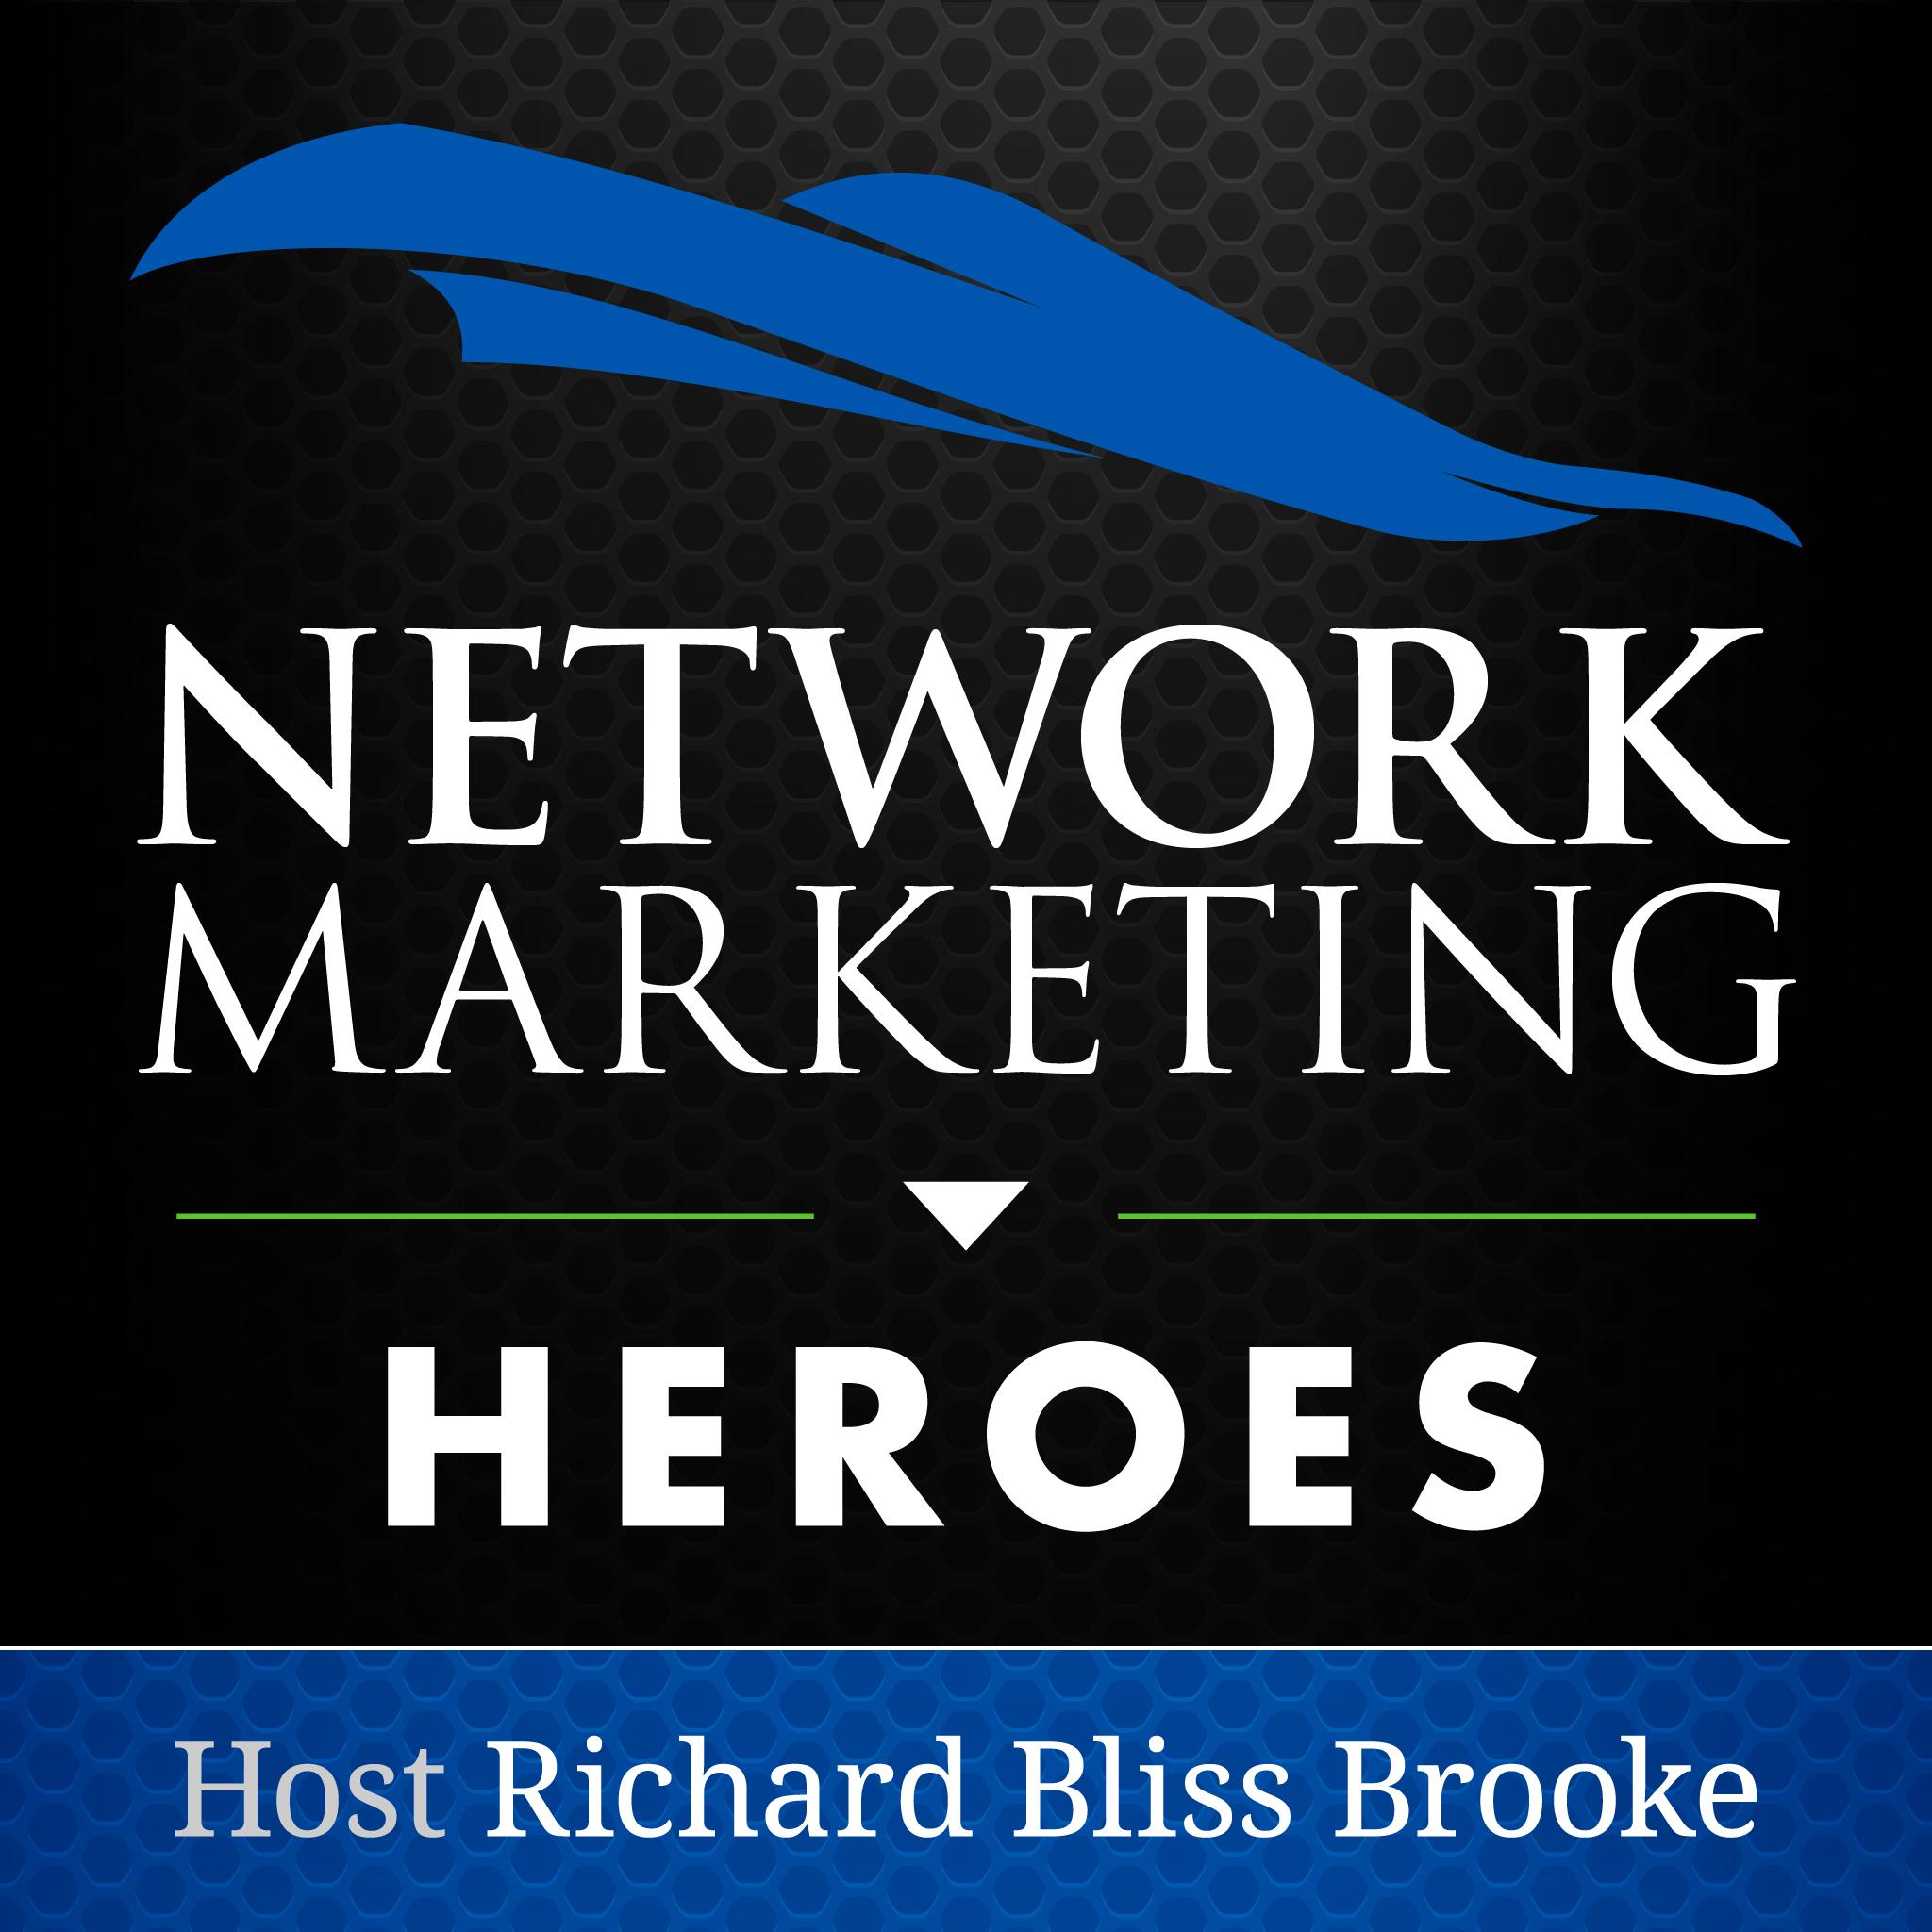 Network Marketing Heroes: Host Richard Bliss Brooke